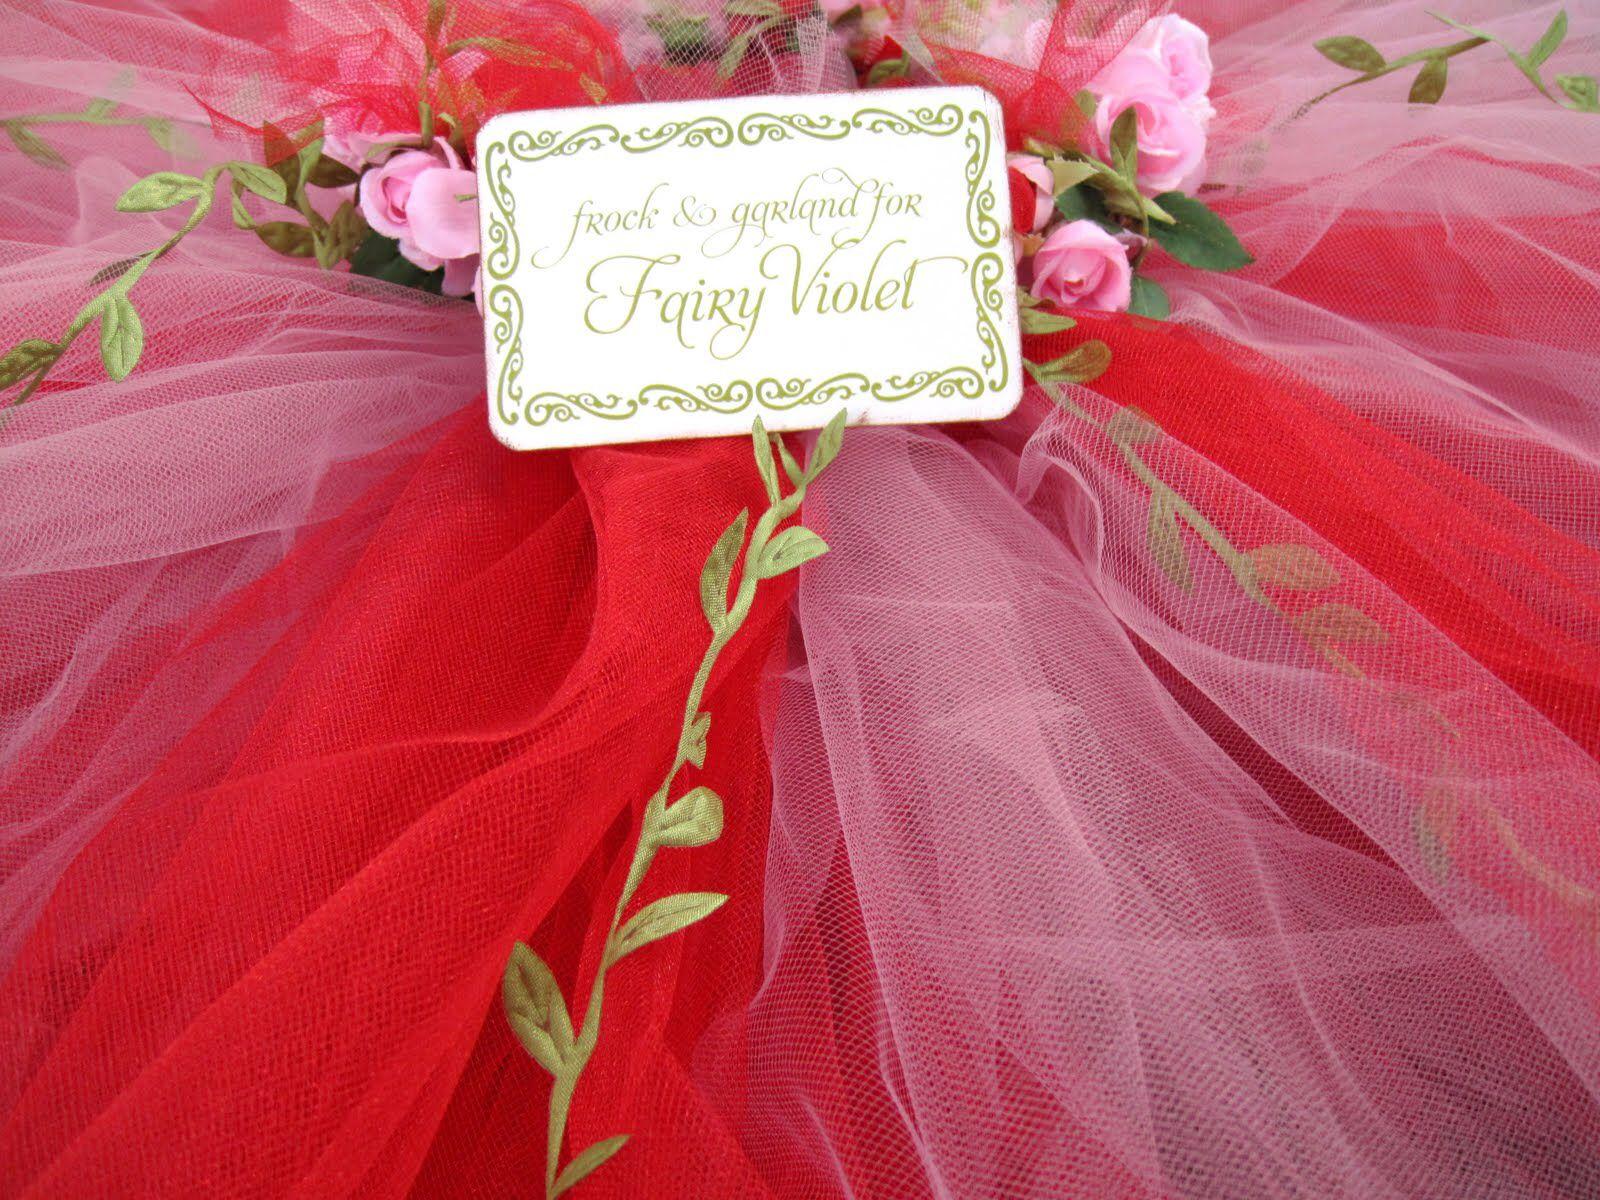 Image from http://gaby.fachrul.com/img/partyideas/fairy-birthday-party-ideas-wallpaper/photos-and-ideas-of-a-beautiful-woodland-fairy-birthday-party1600-x-1200-296-kb-jpeg-x.jpg.